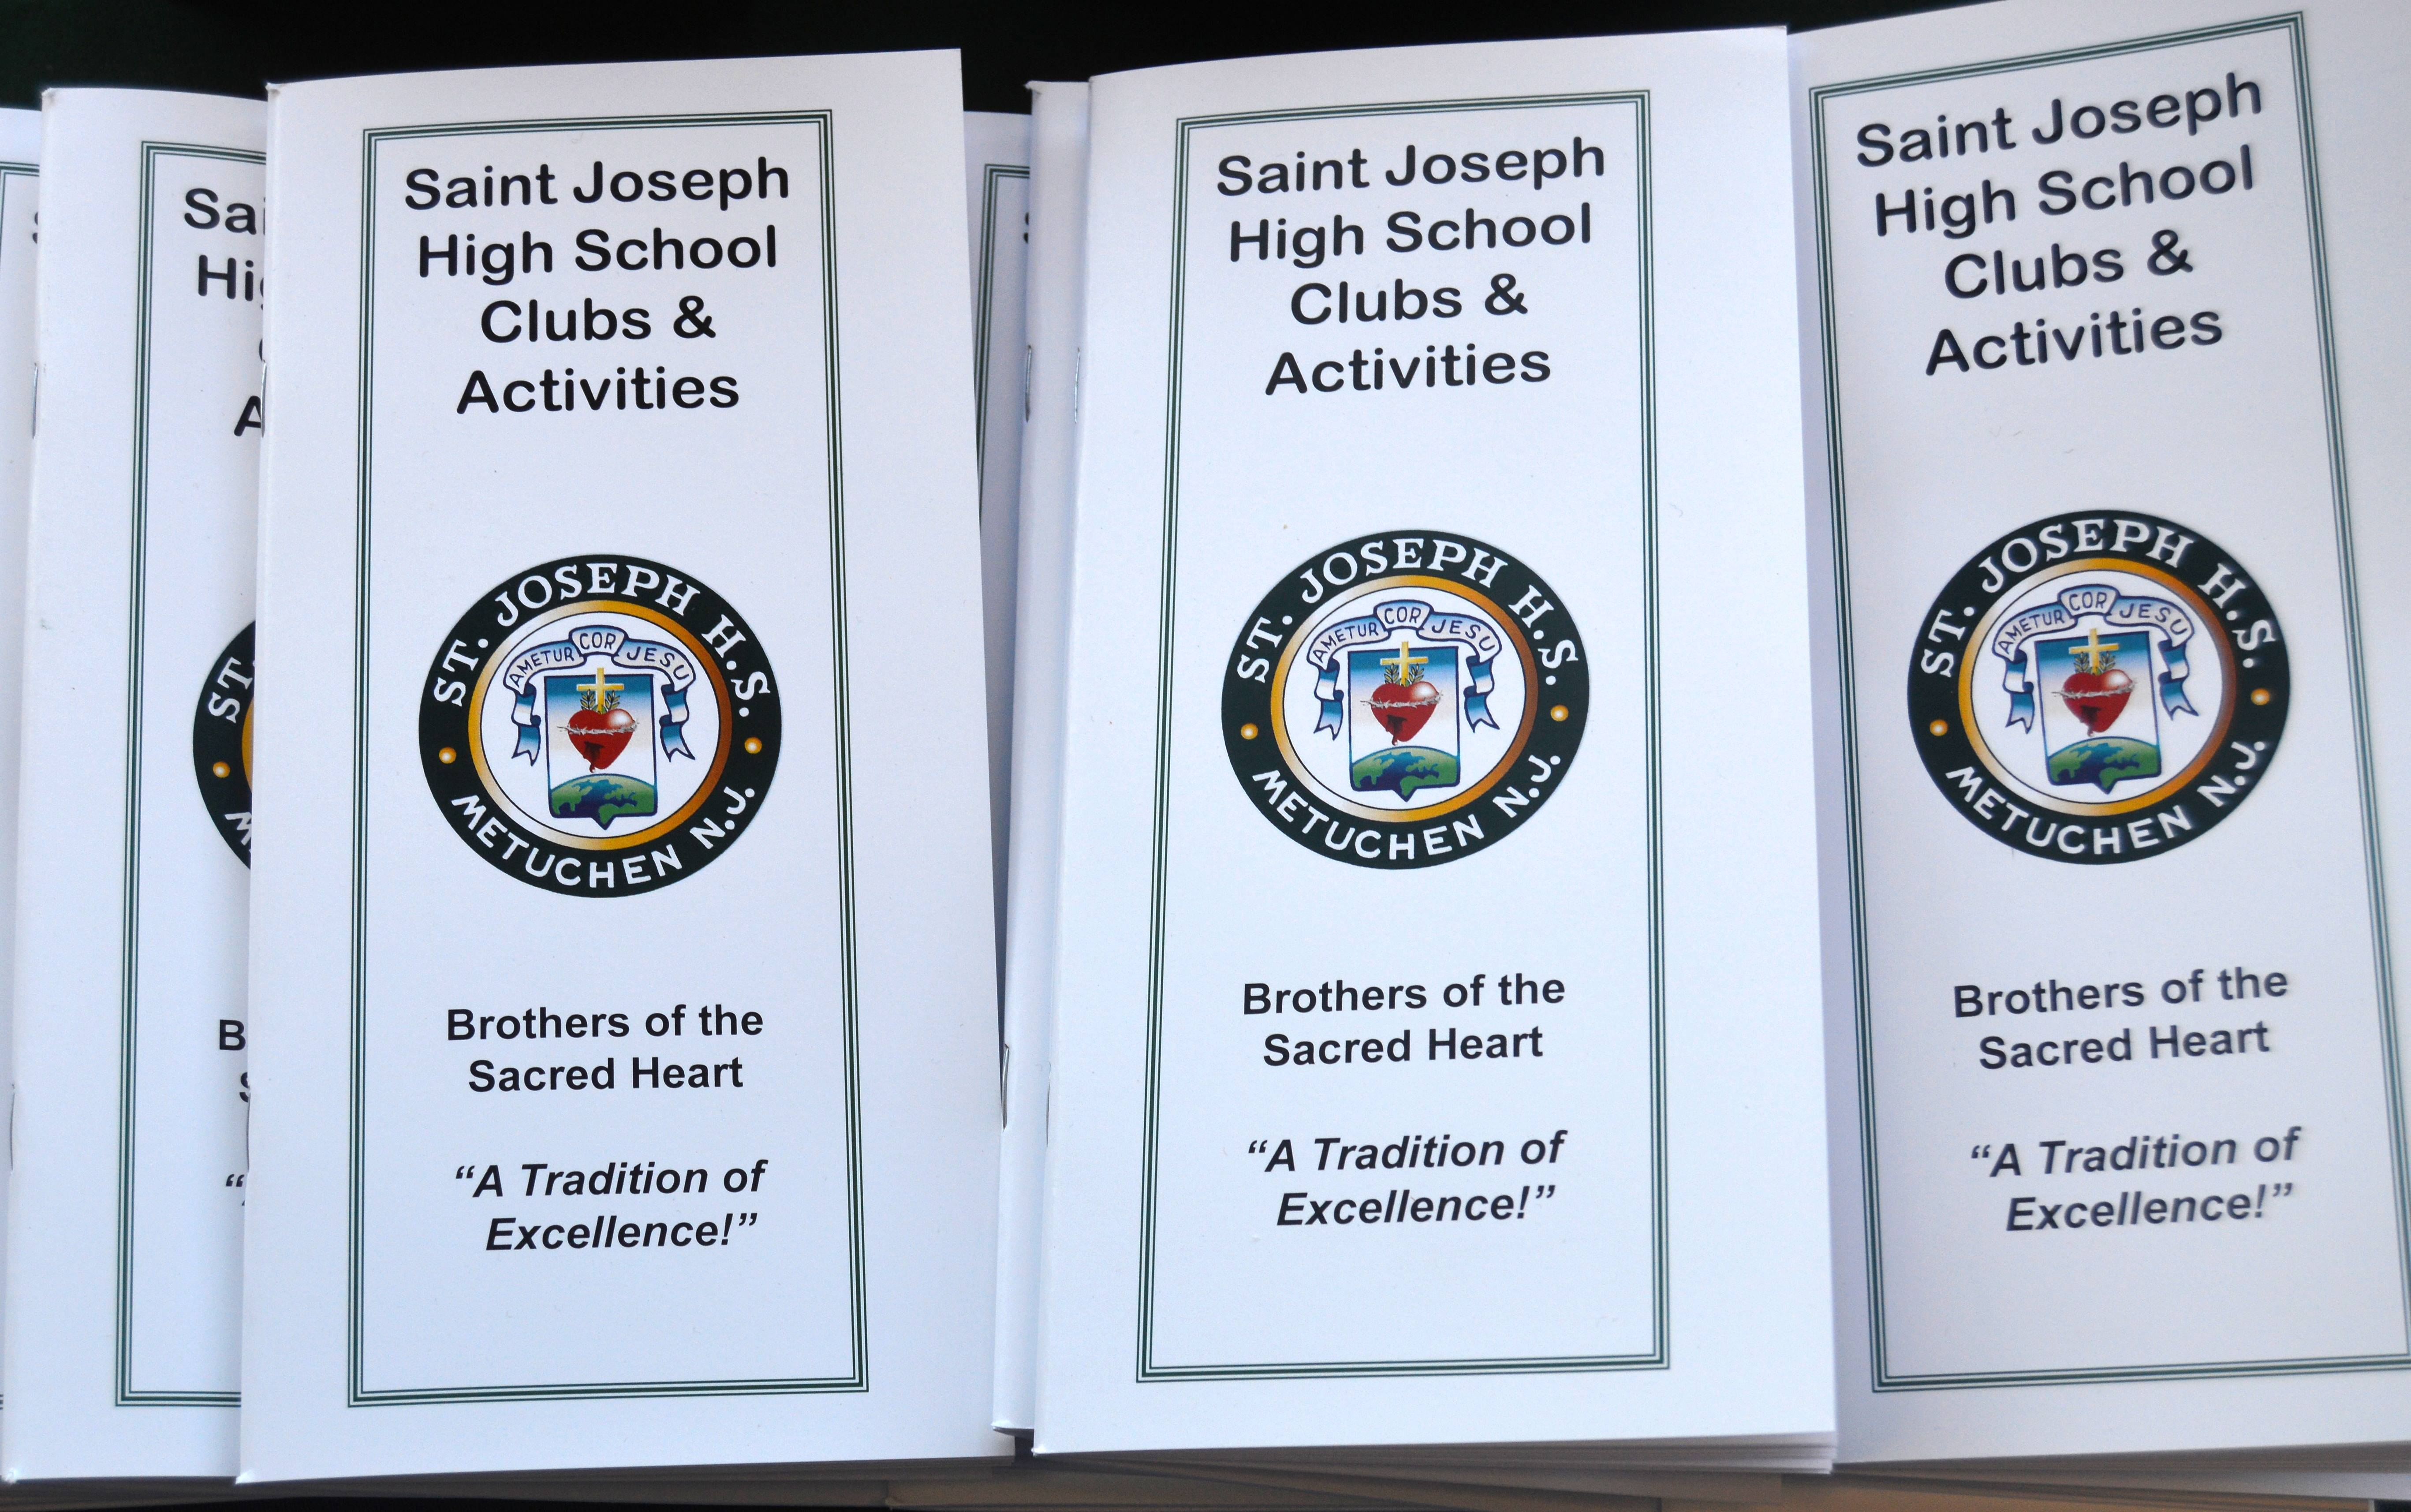 d027e8684c60519f4190_Clubs_and_Activities_brochures_10-18-15.JPG